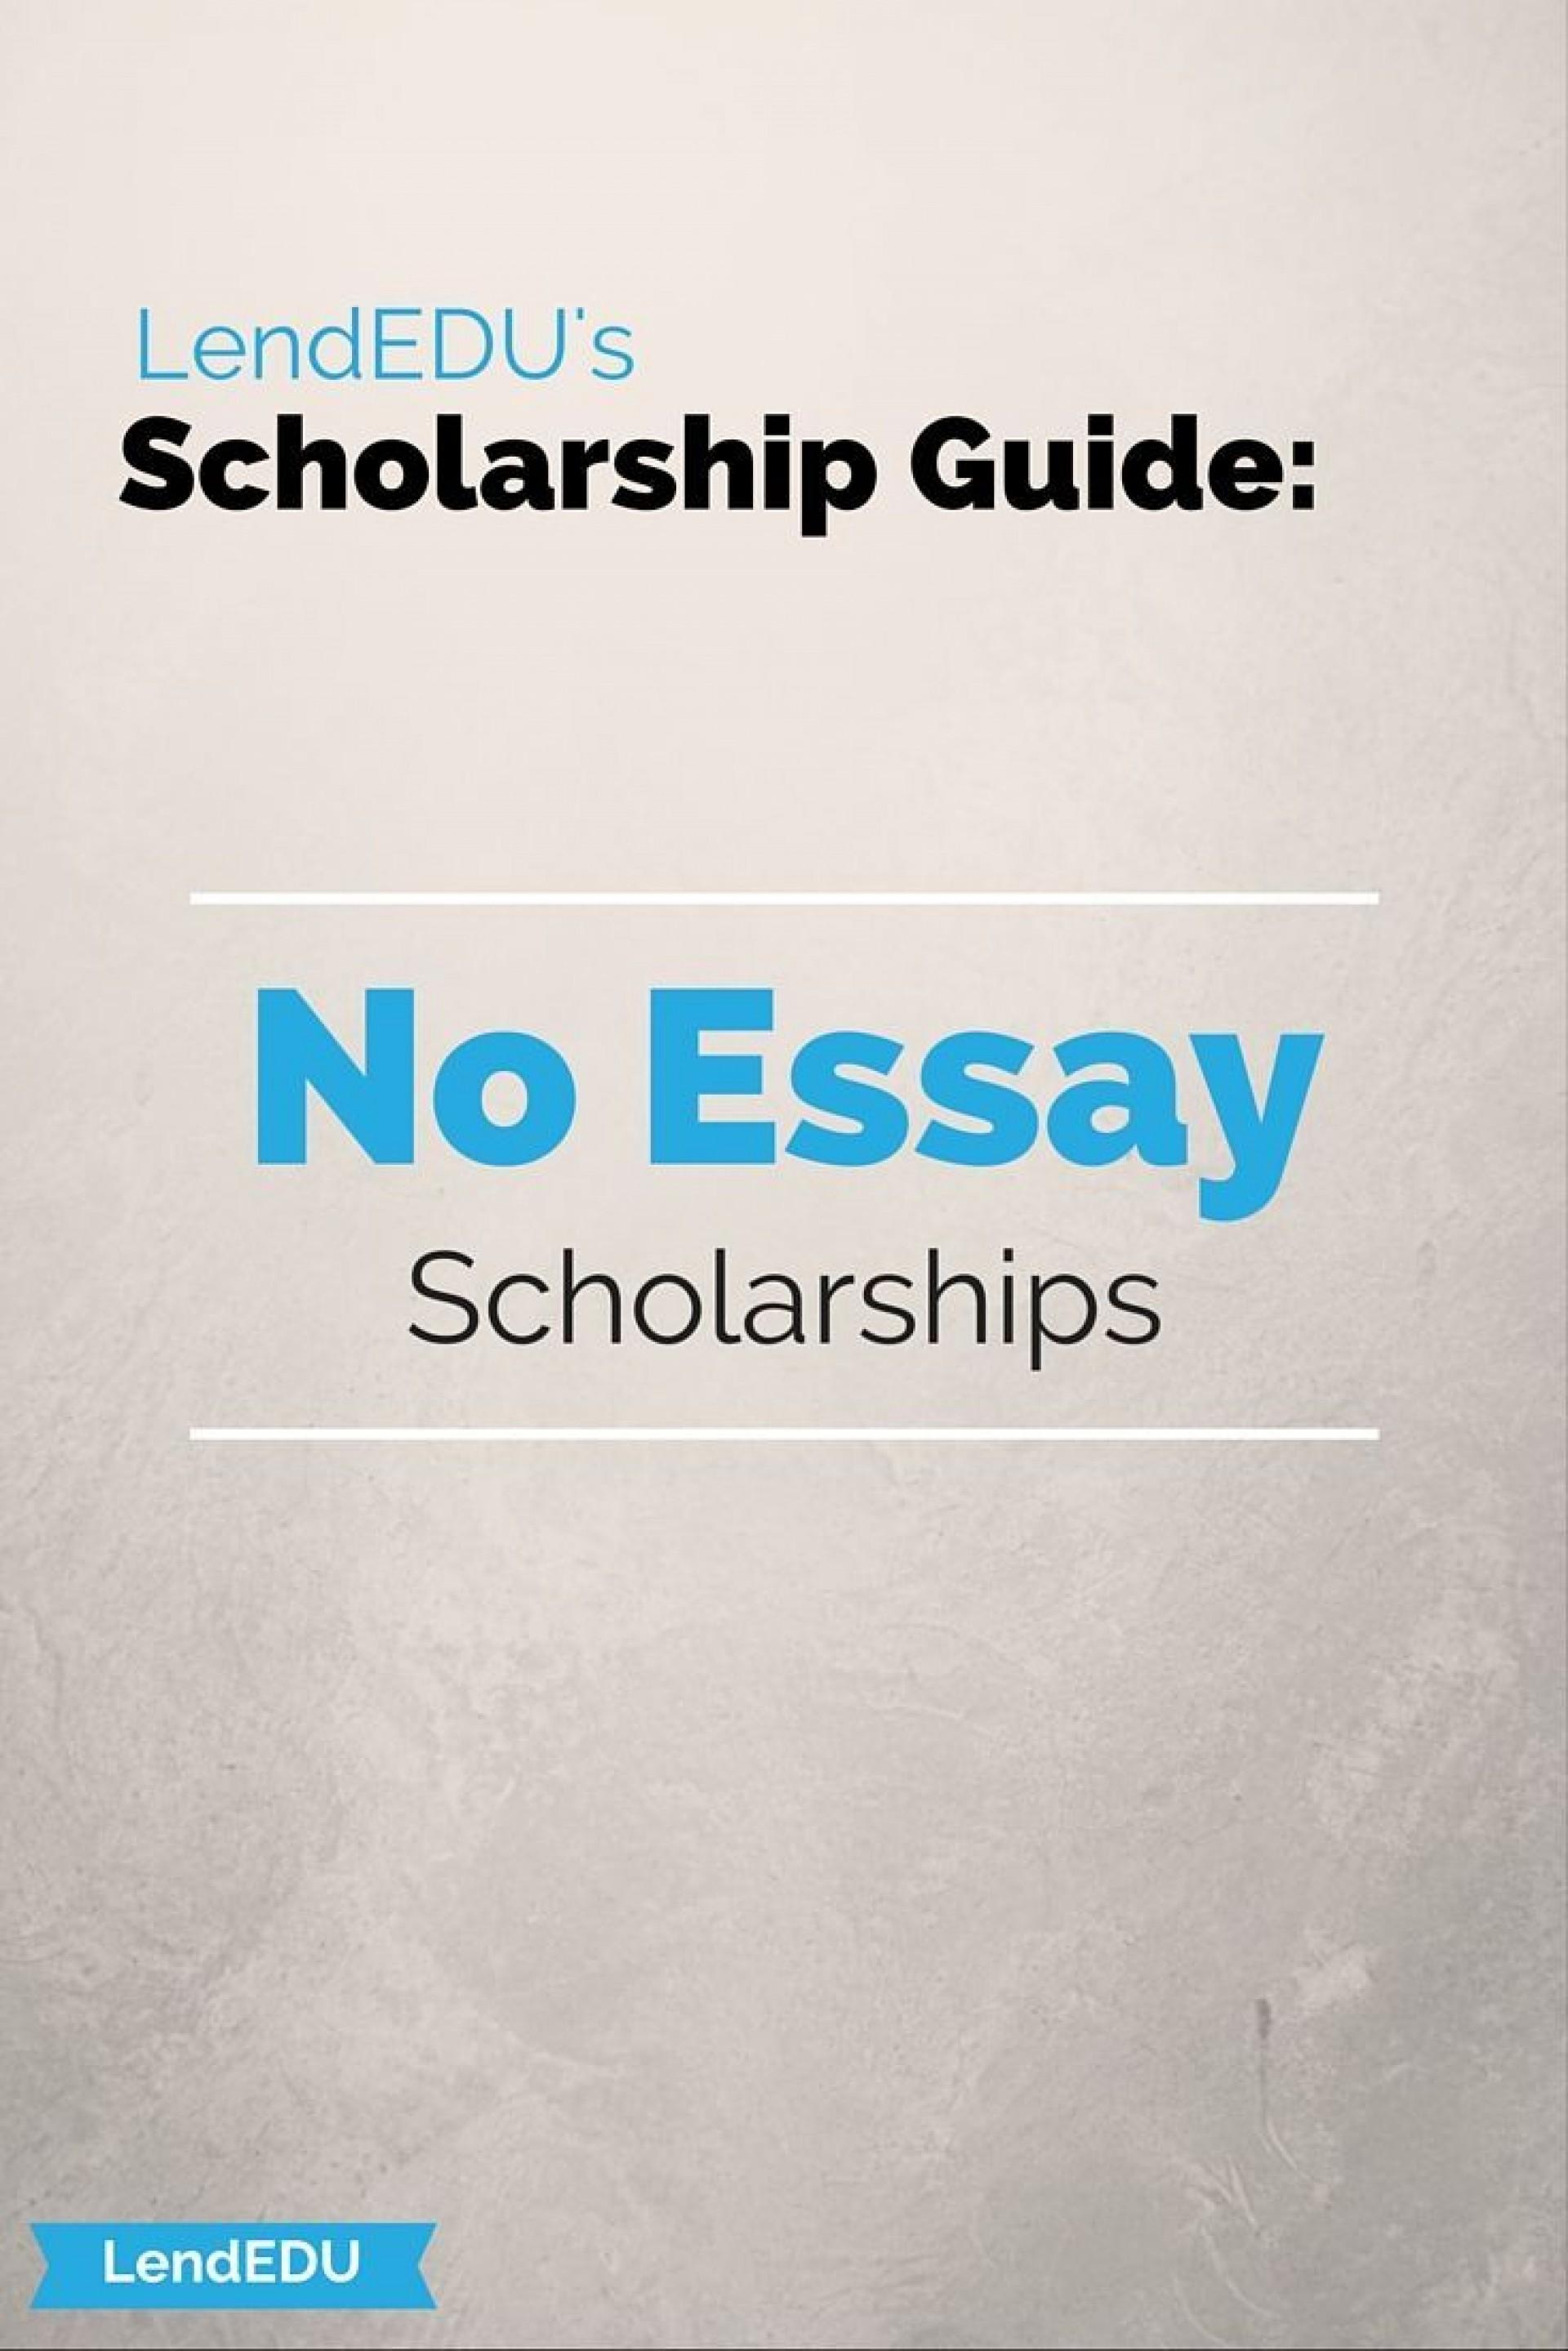 007 Essay Example No Scholarships For High School Rare Seniors 2017 2019 1920